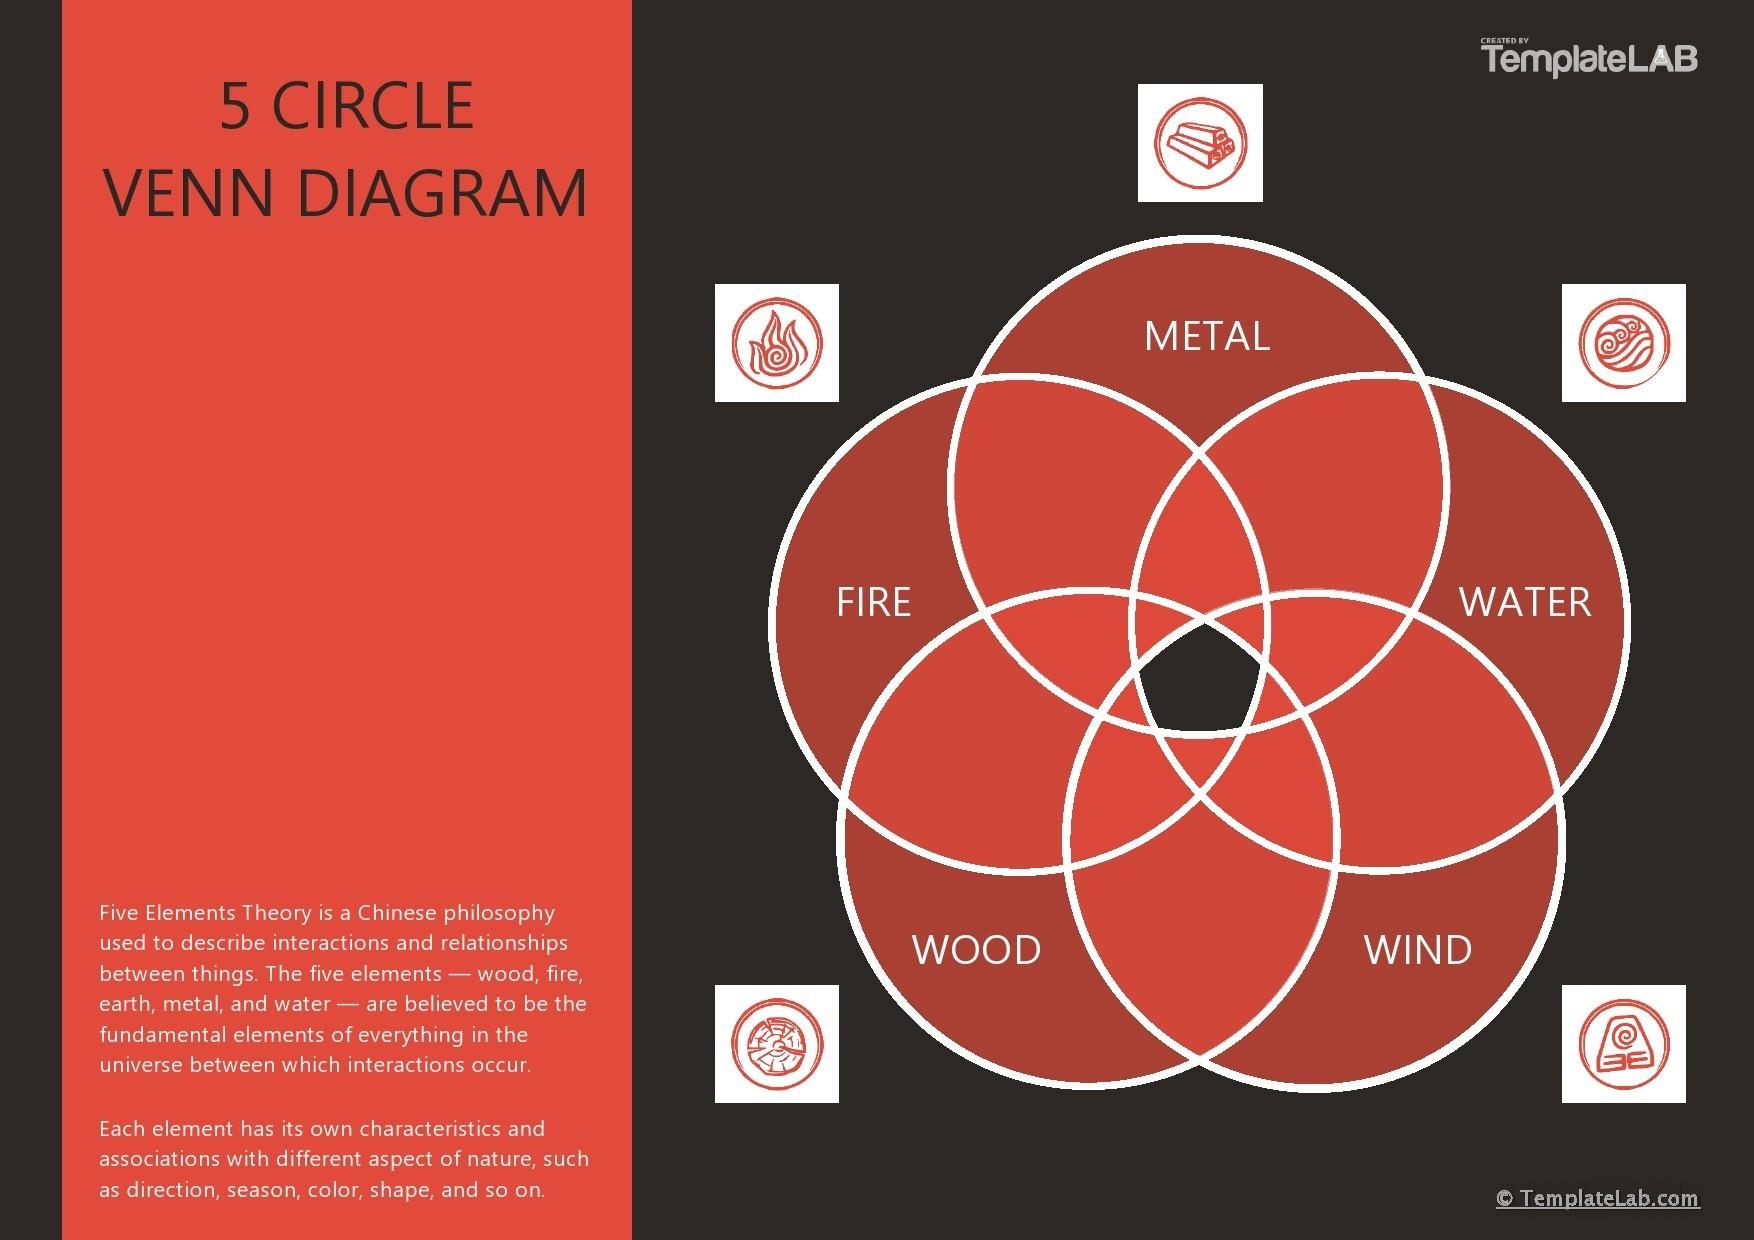 Free 5 Circle Venn Diagram Template - TemplateLab.com